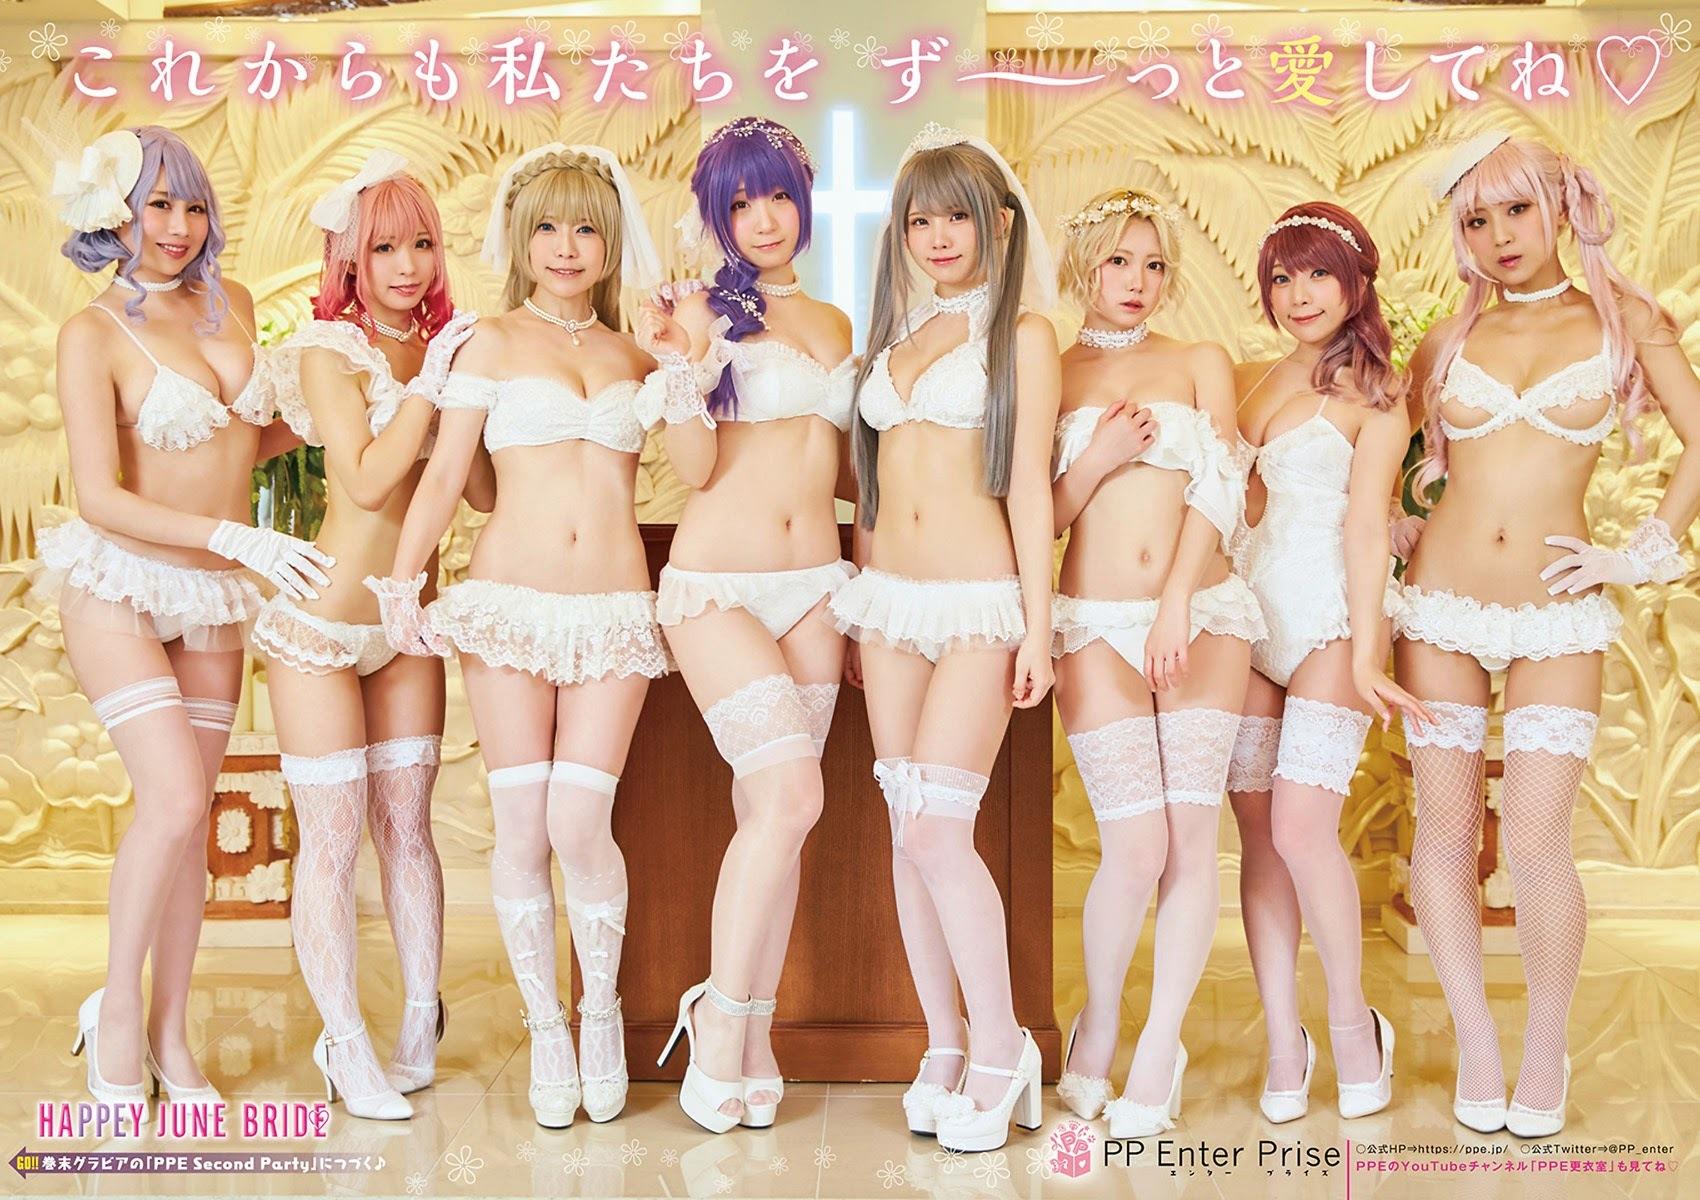 enako 伊织萌 &PPE姑娘们-YOUNG ANIMAL 2021年第十三期  高清套图 第1张